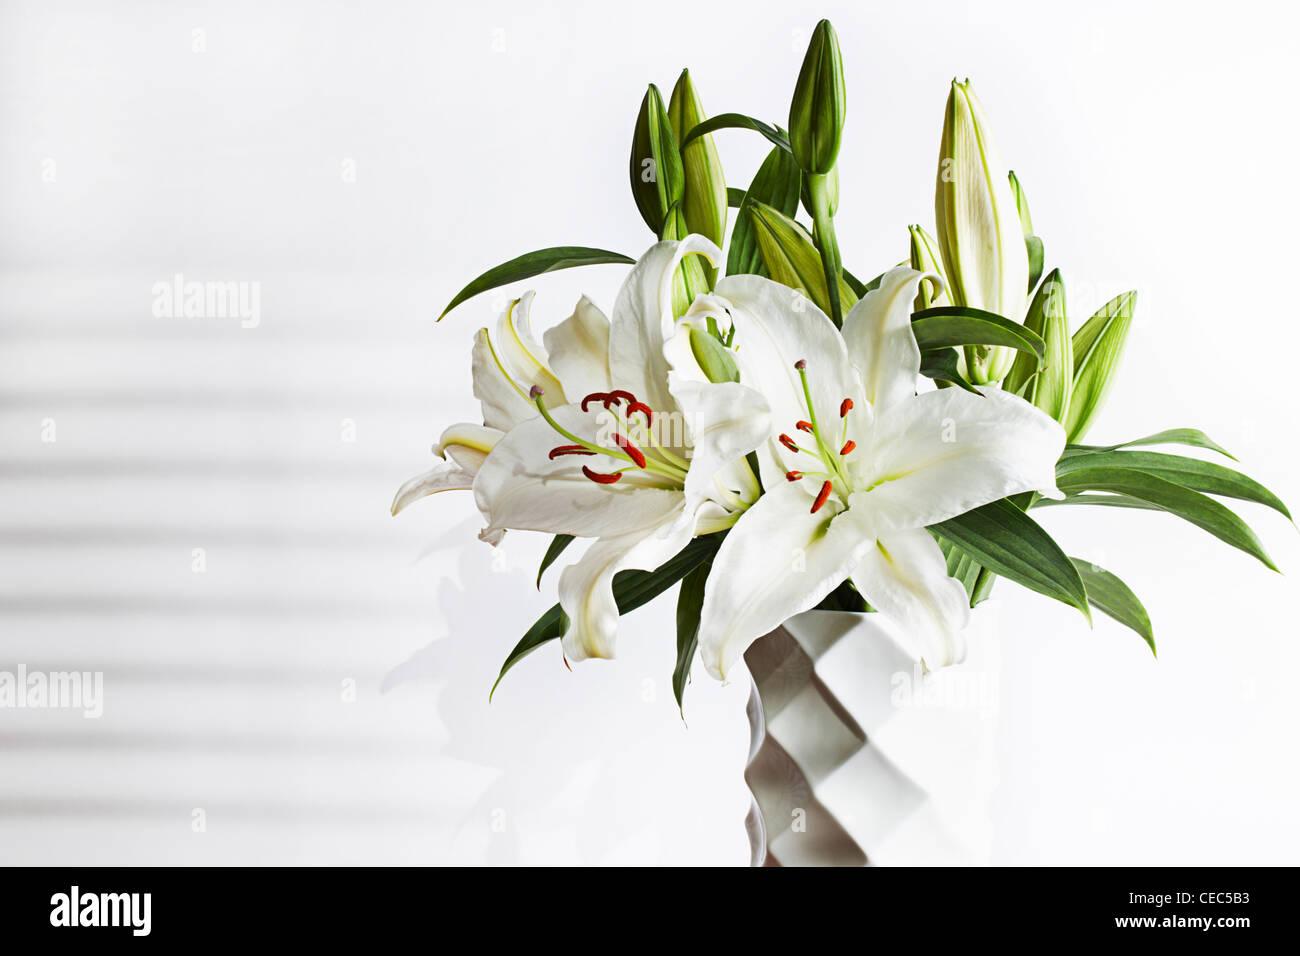 White lily lilium candidum madonna lily stock photo 43293575 alamy izmirmasajfo Gallery